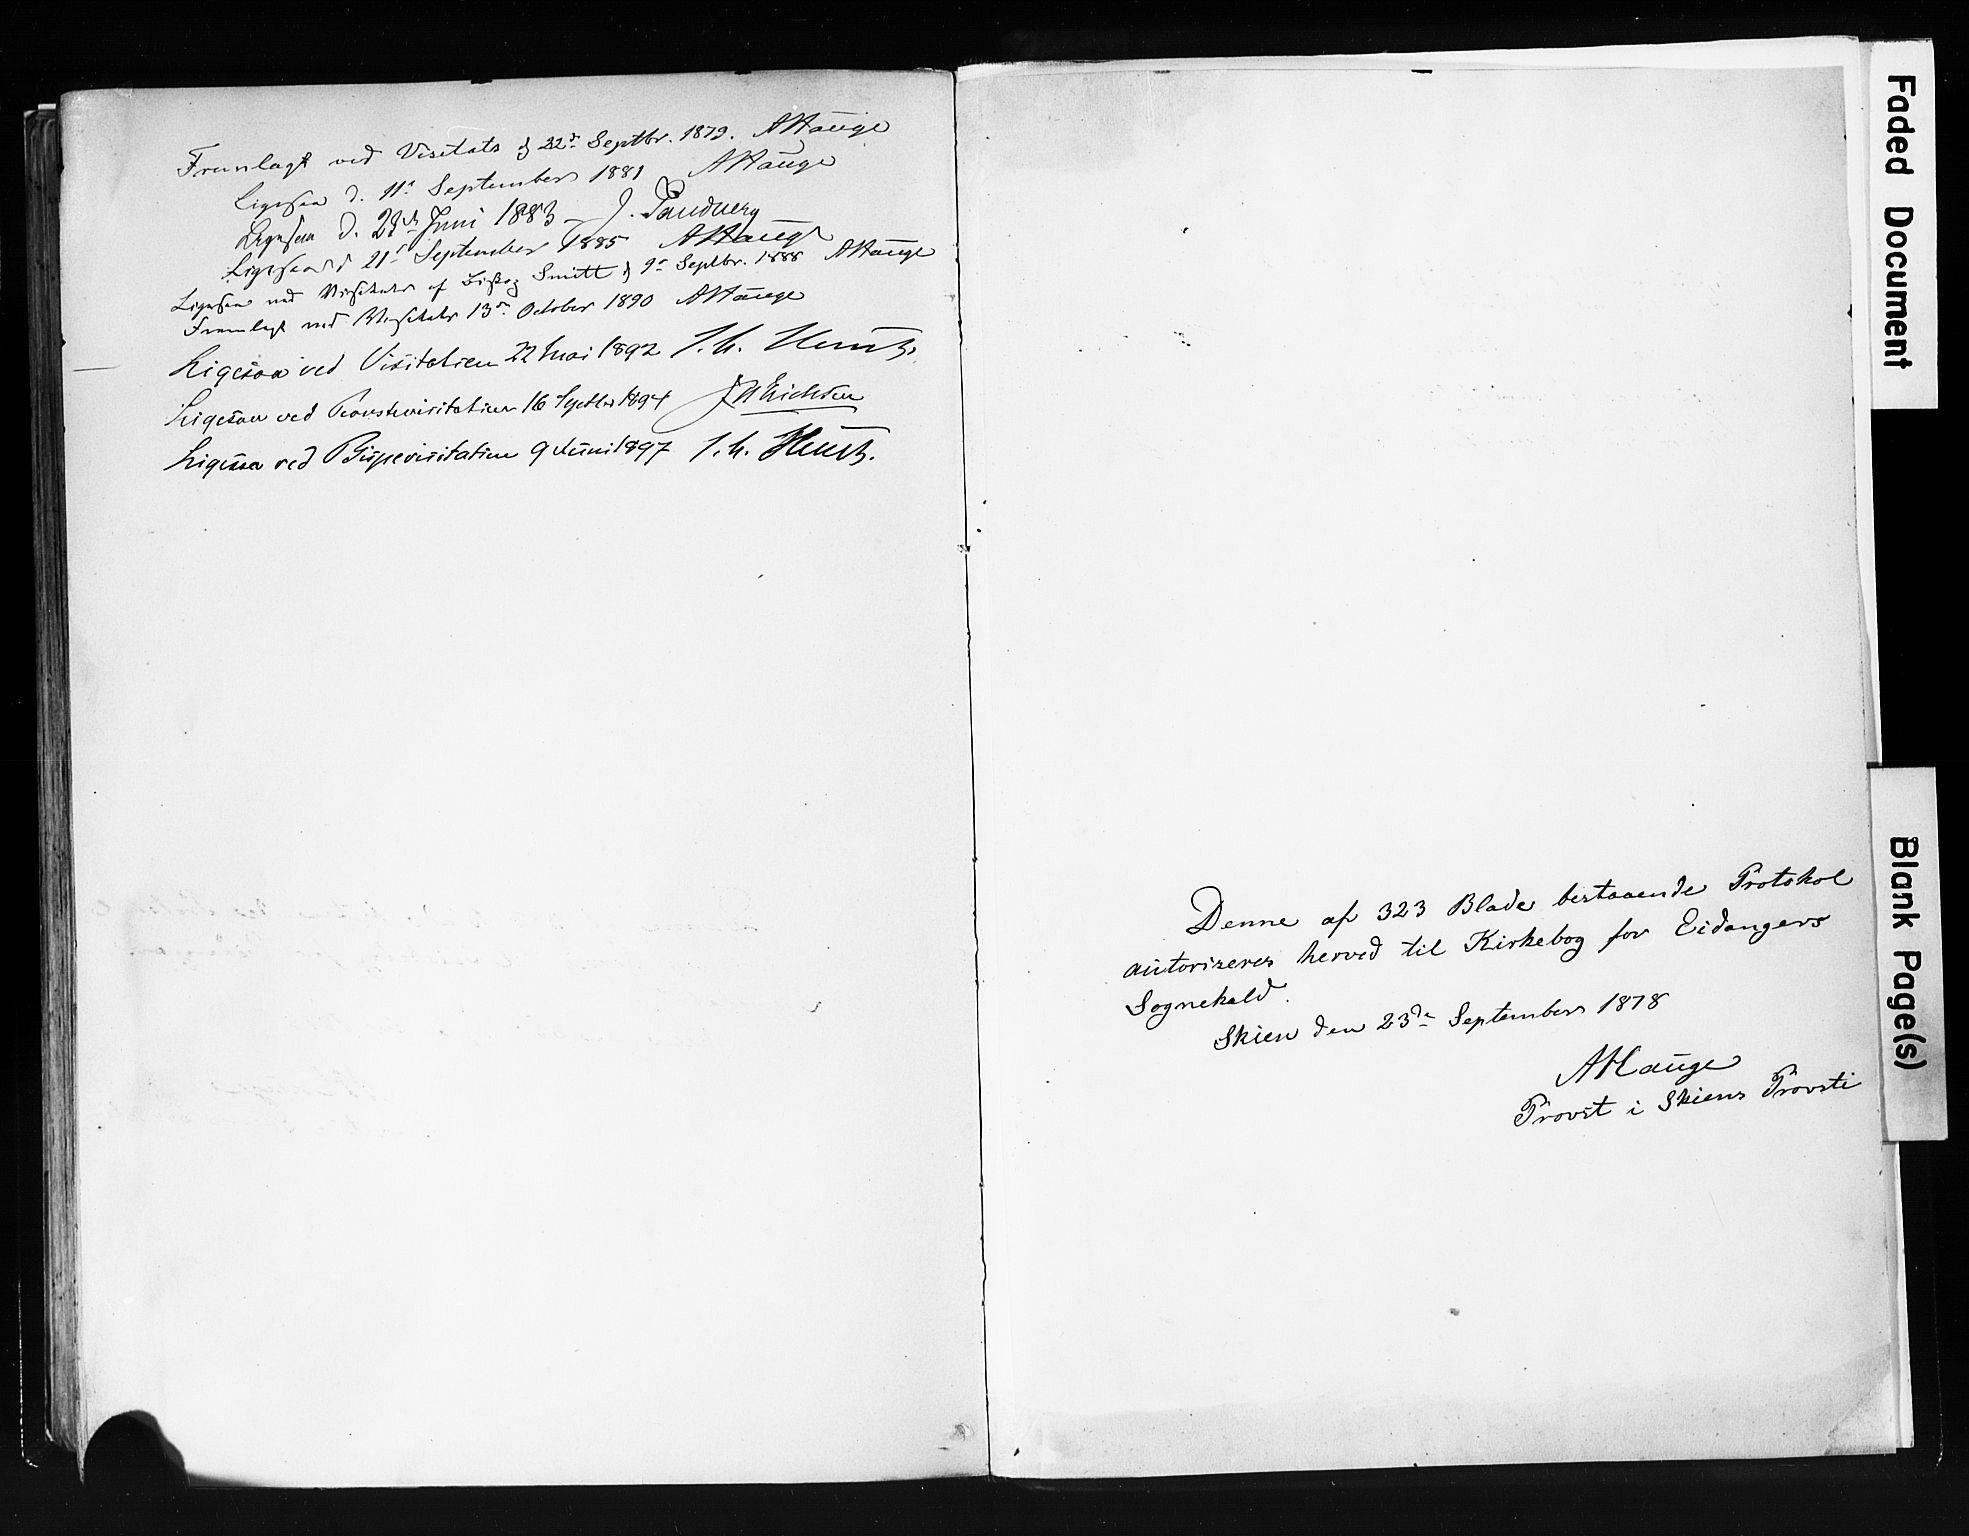 SAKO, Eidanger kirkebøker, F/Fa/L0012: Parish register (official) no. 12, 1879-1900